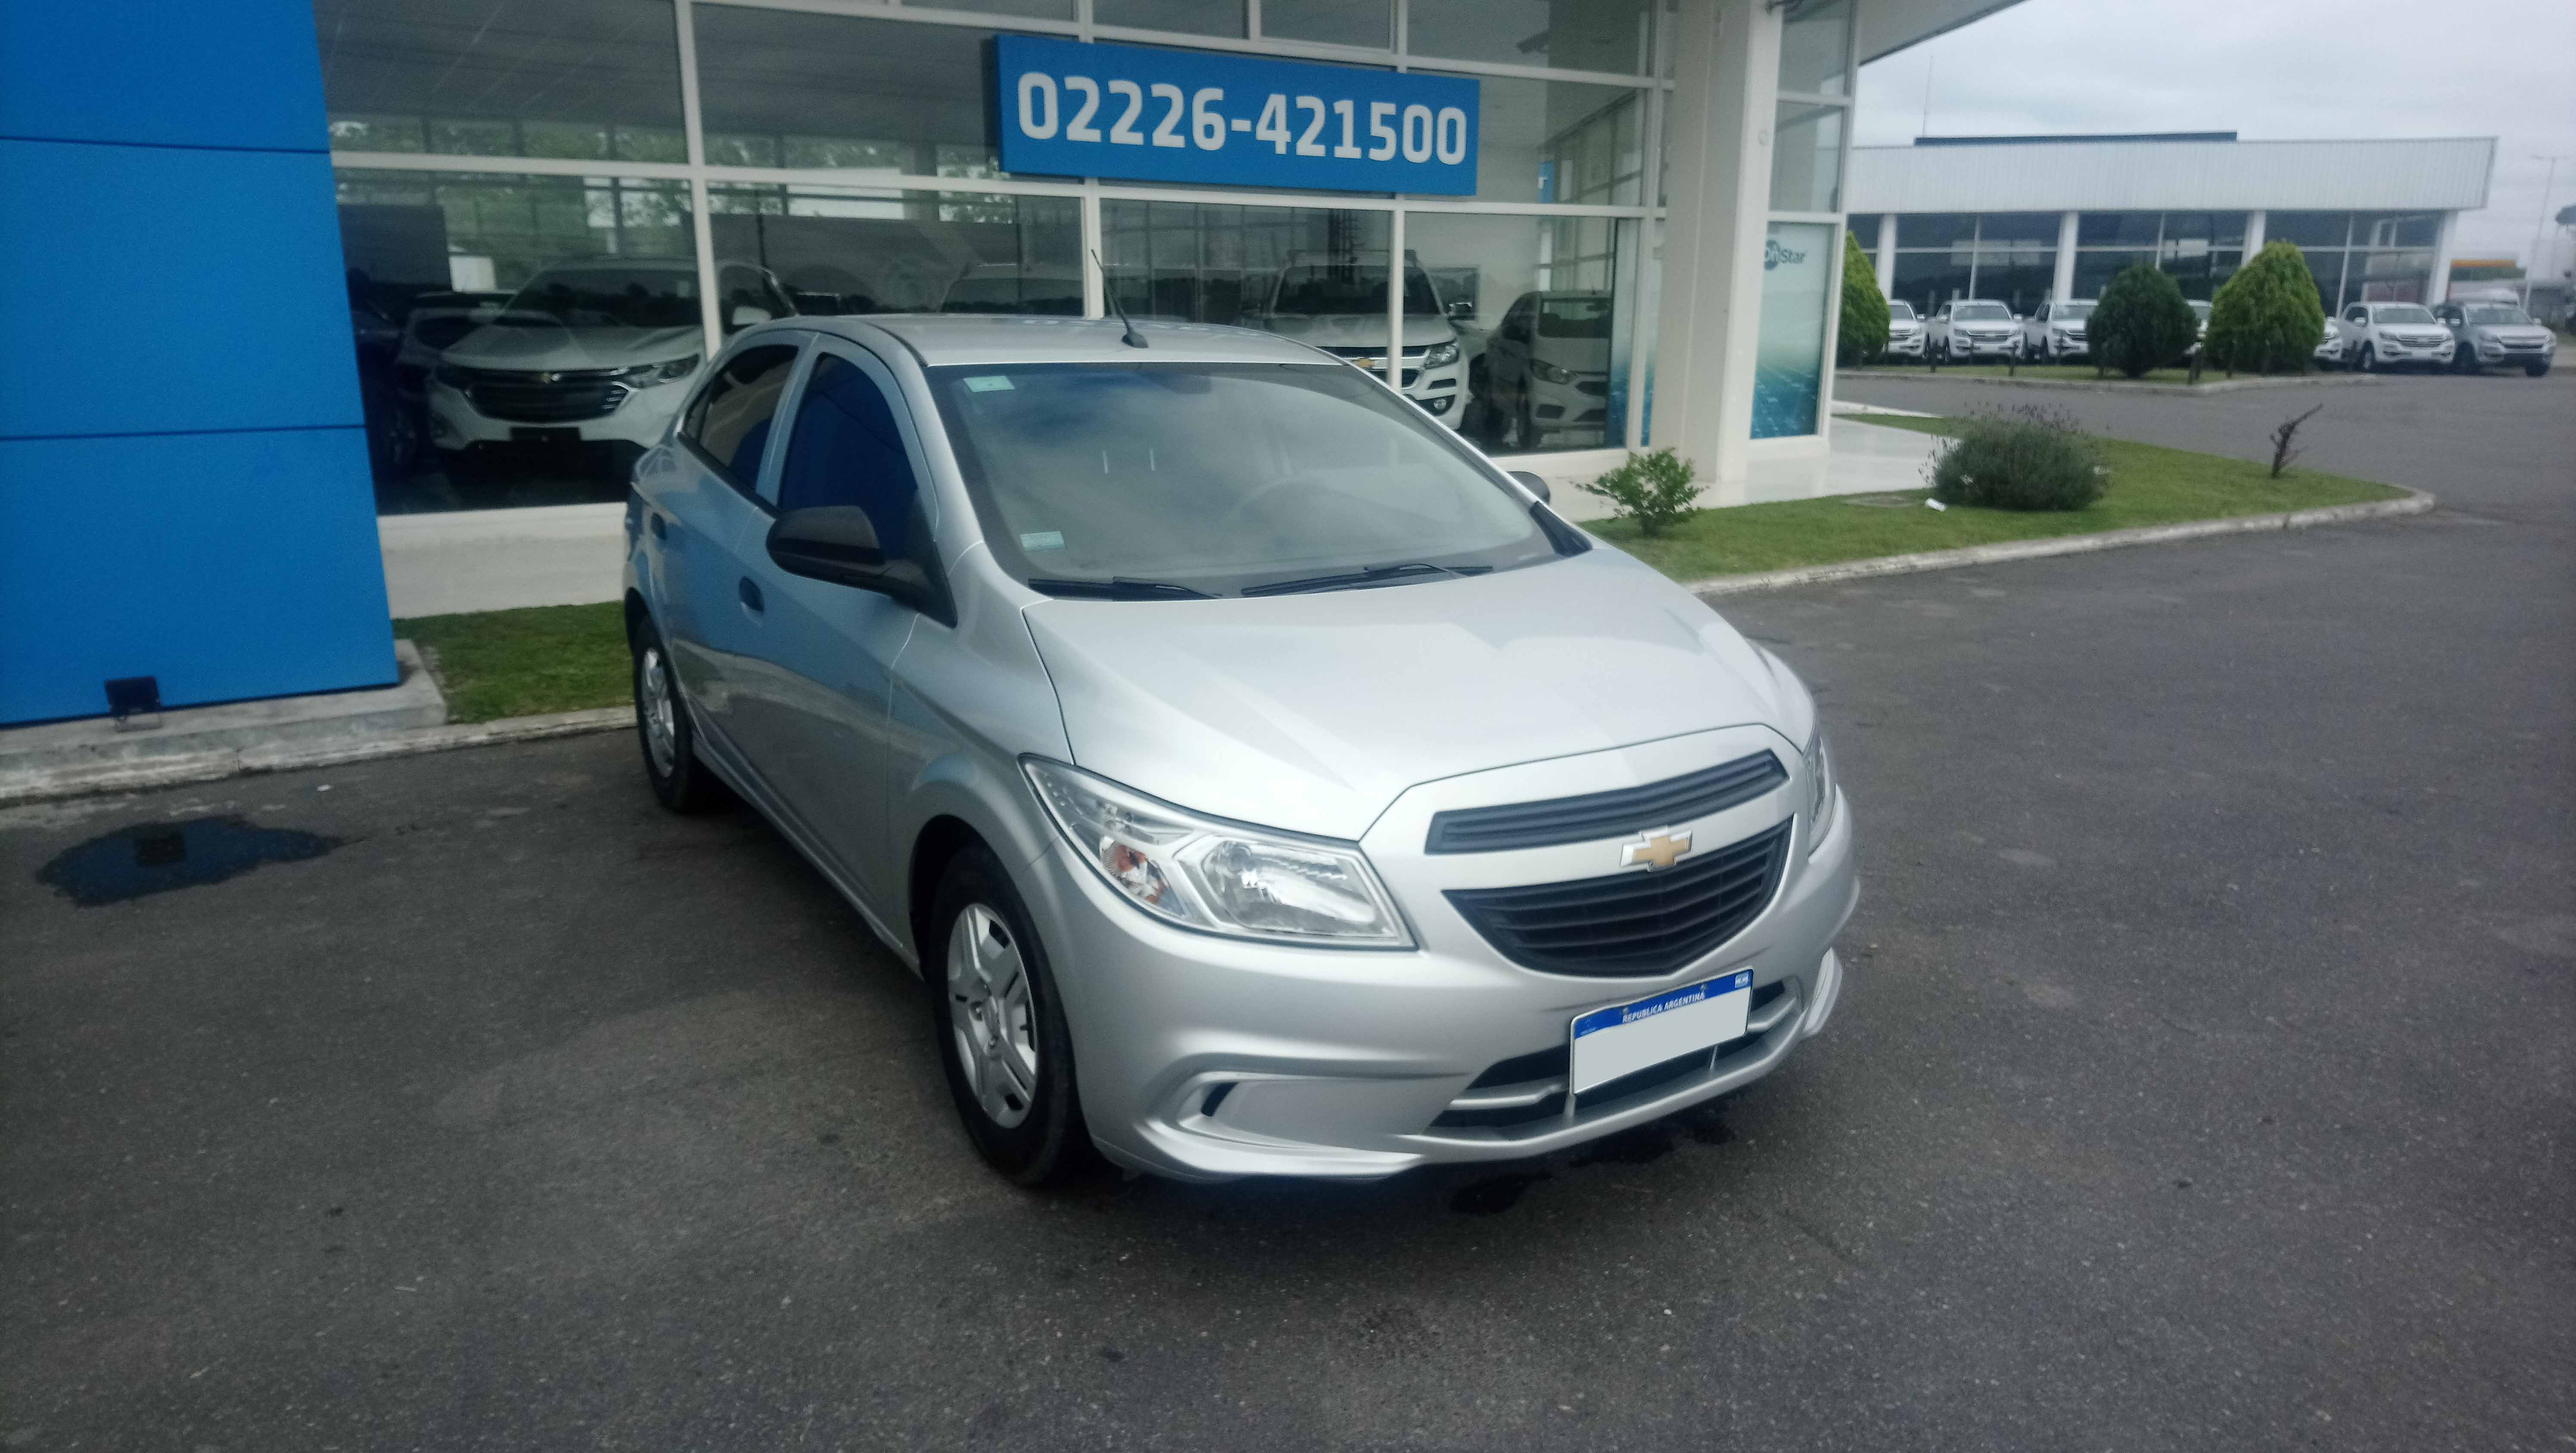 2017 Chevrolet Onix Joy 1.4L